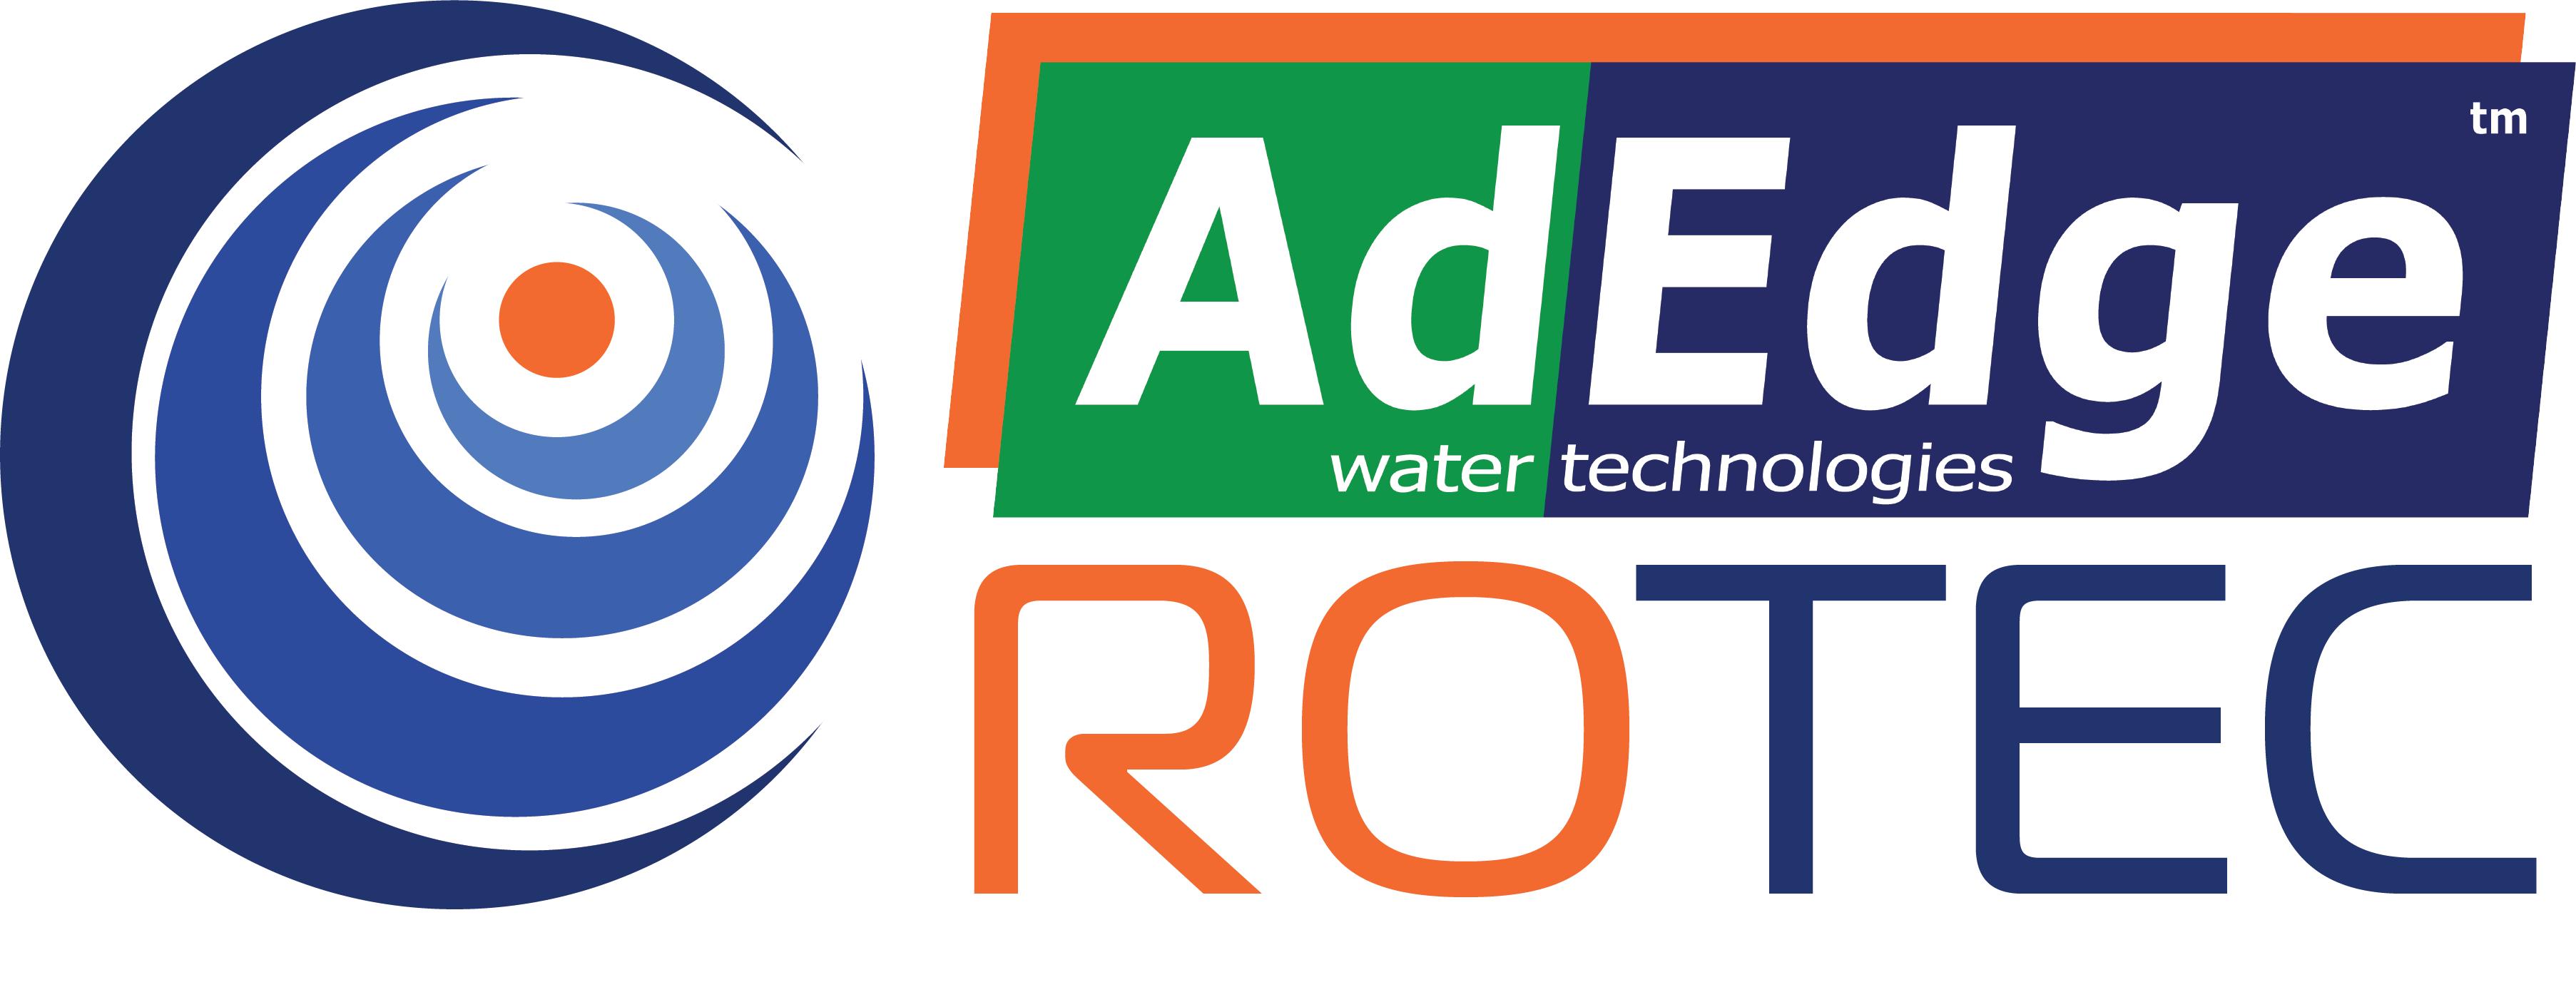 AdEdge-Rotec Logo